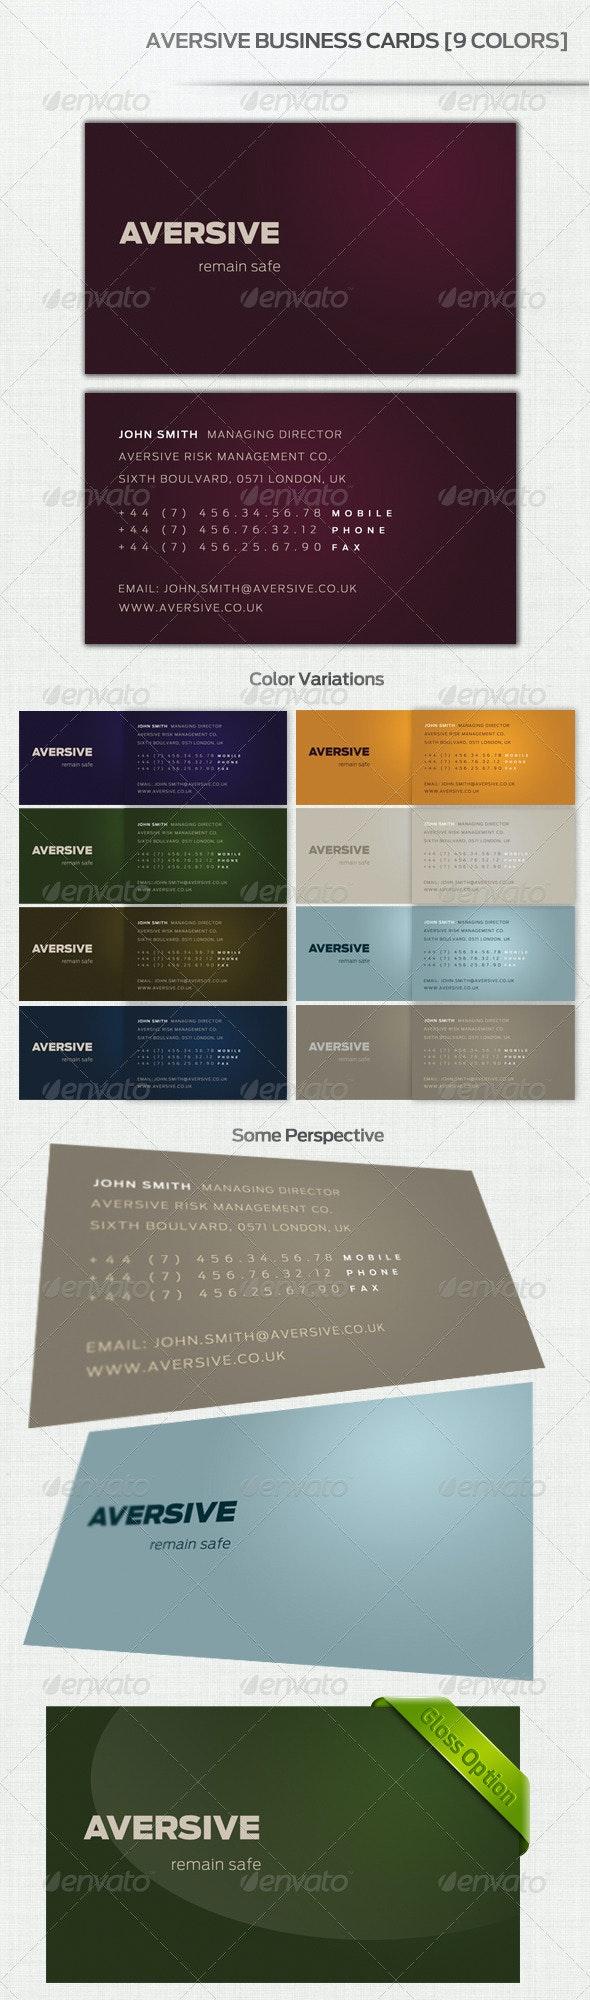 Aversive Business Cards [9 Colors] - Corporate Business Cards